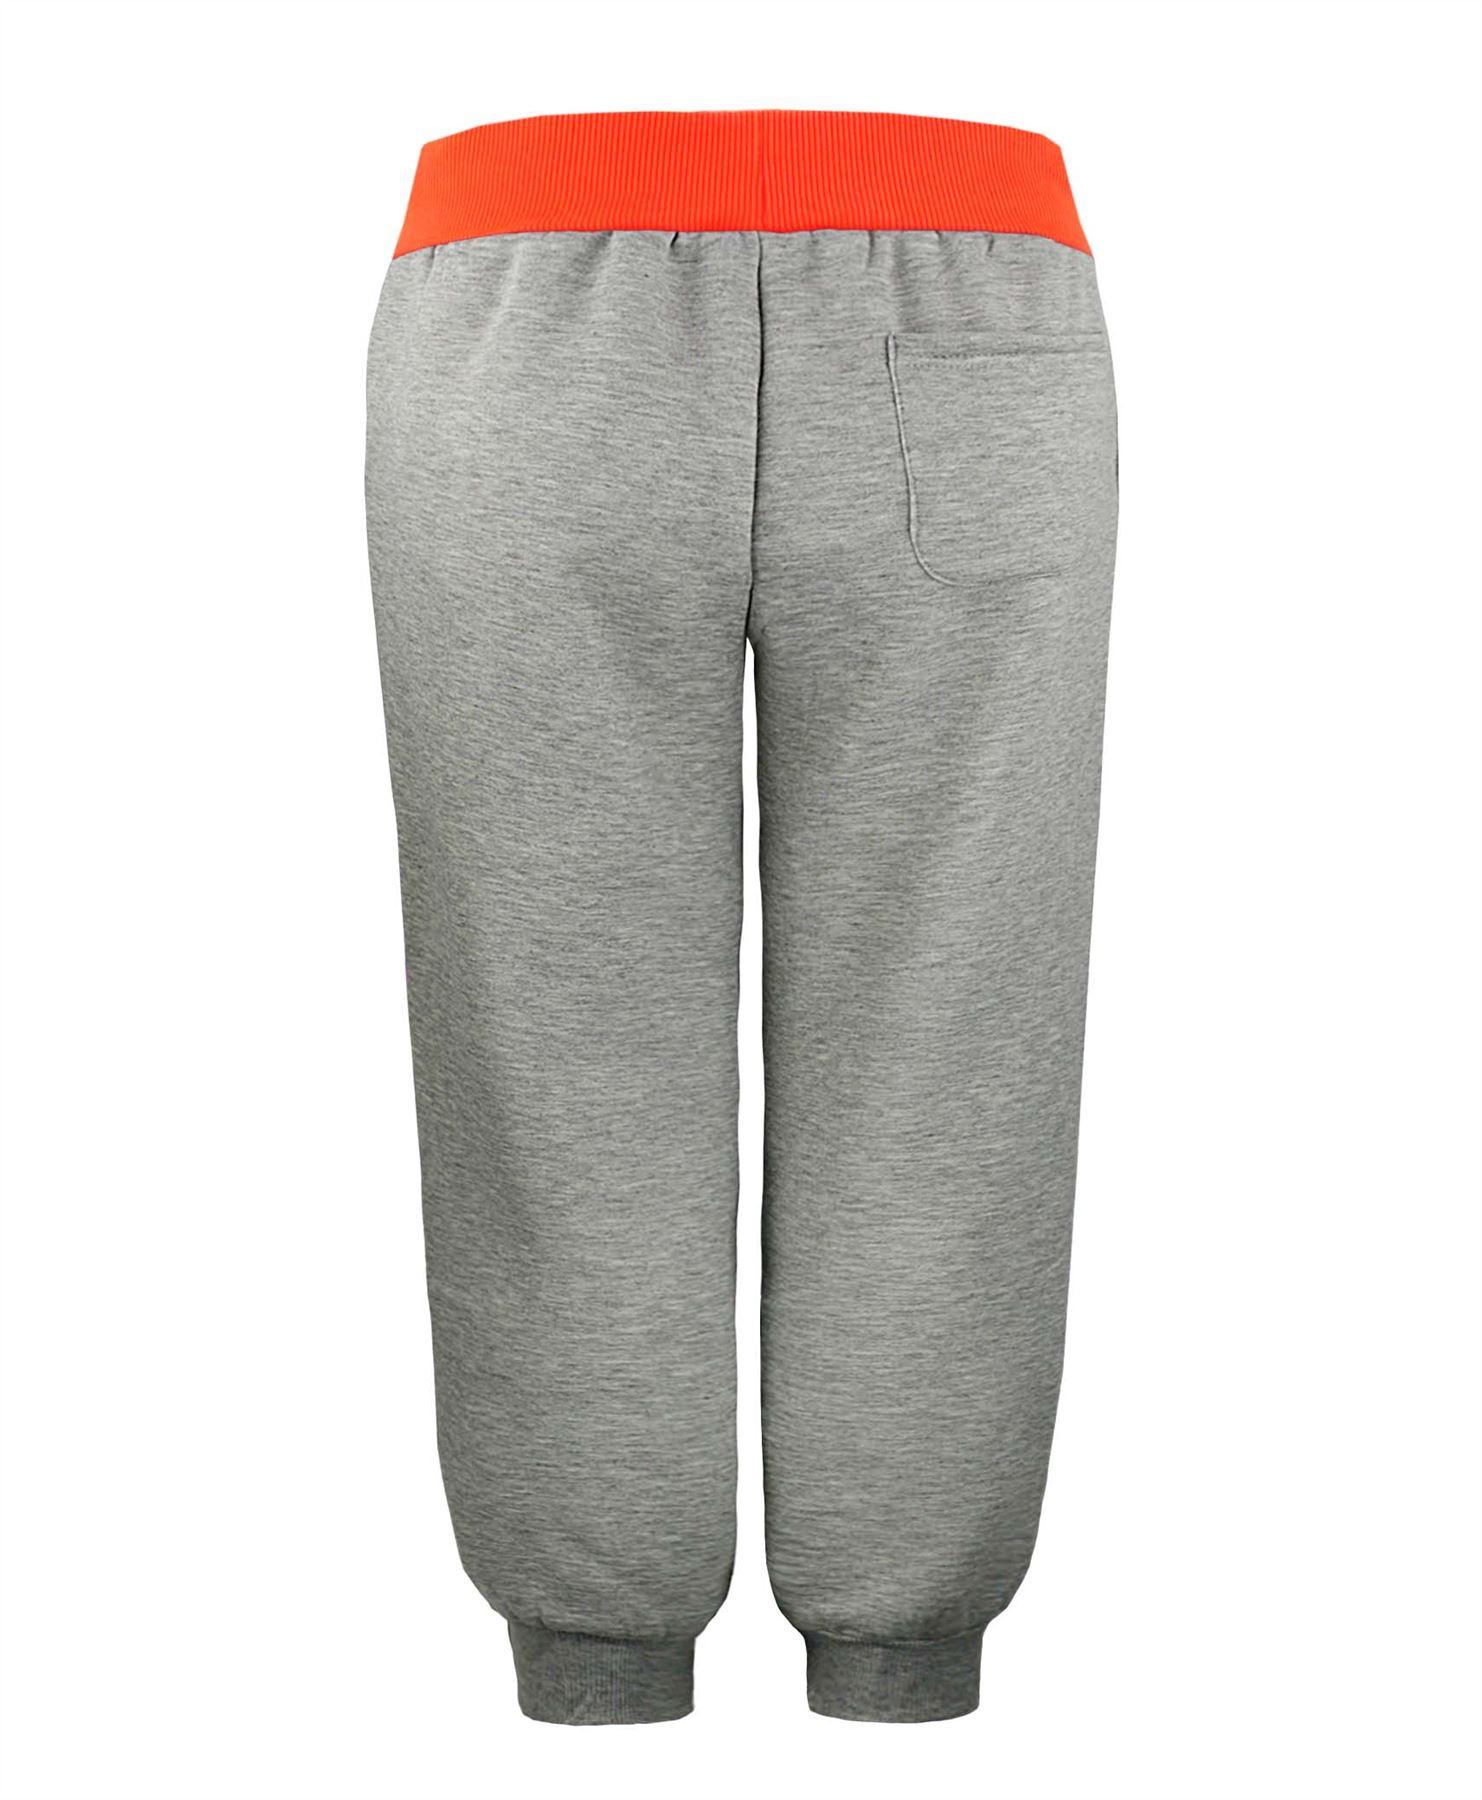 Shop liveblog.ga for boys' pants. Enjoy free shipping and returns with NikePlus.